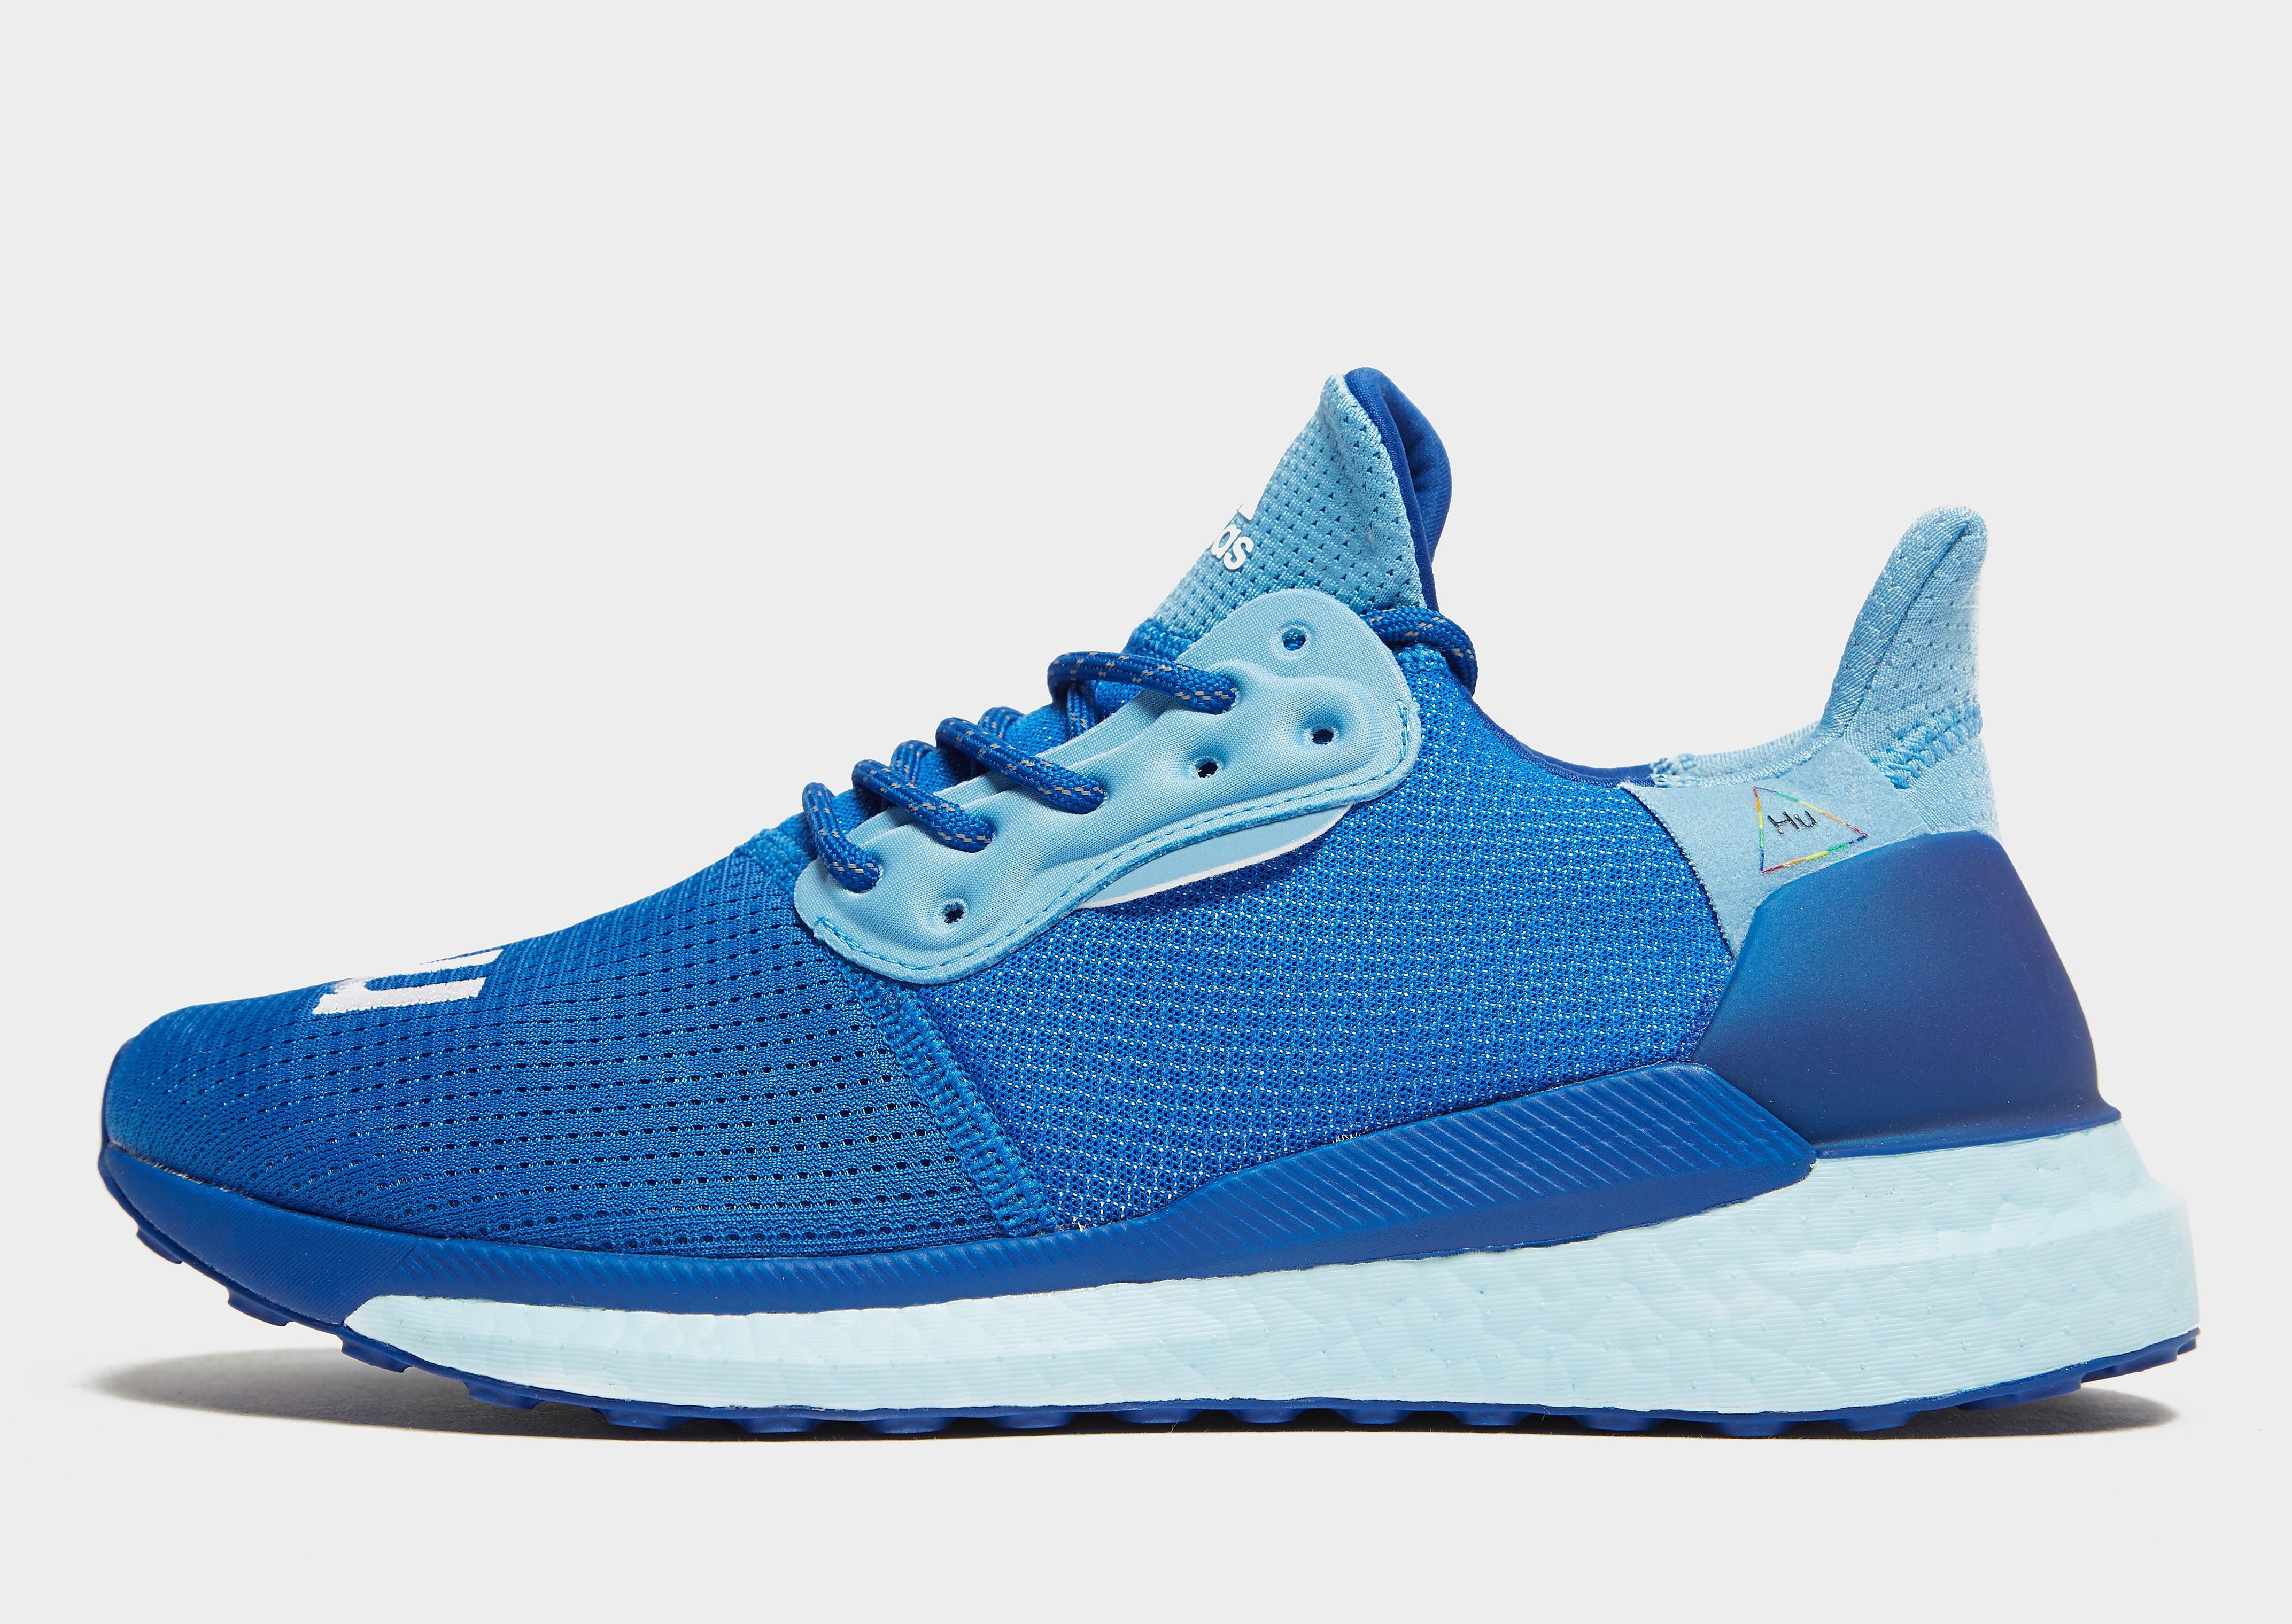 Adidas x Pharrell Williams Solar Hu Prd, Azul